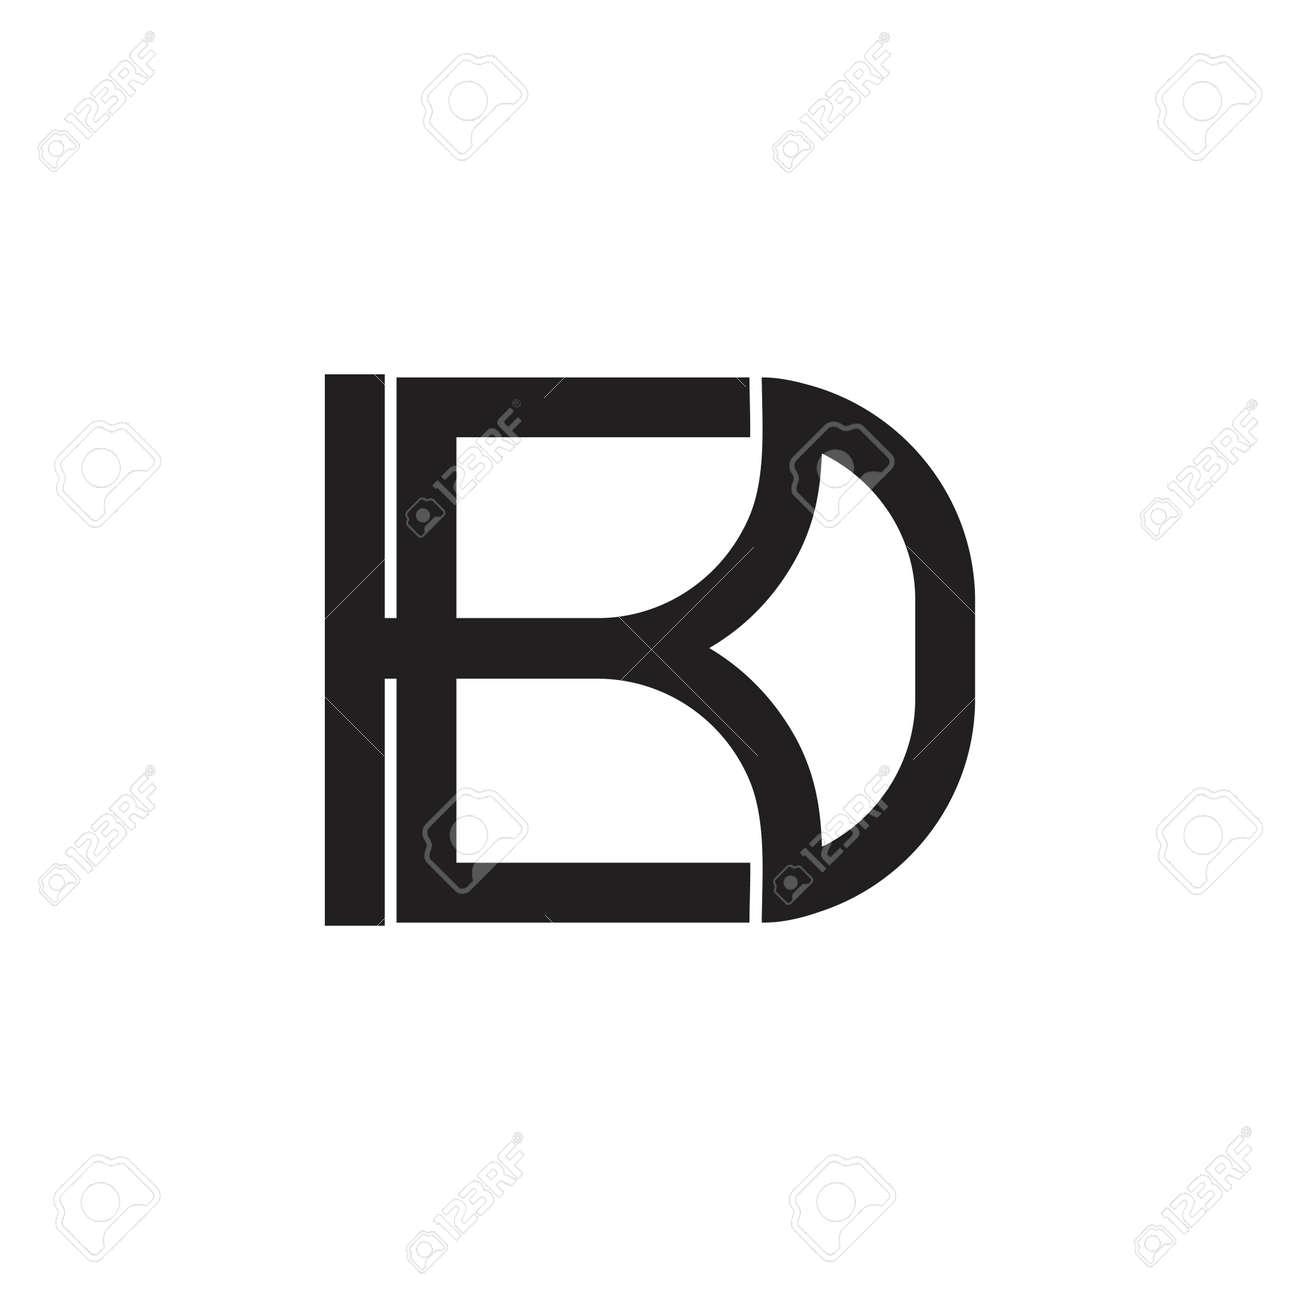 letter kd linked geometric line logo - 119346814